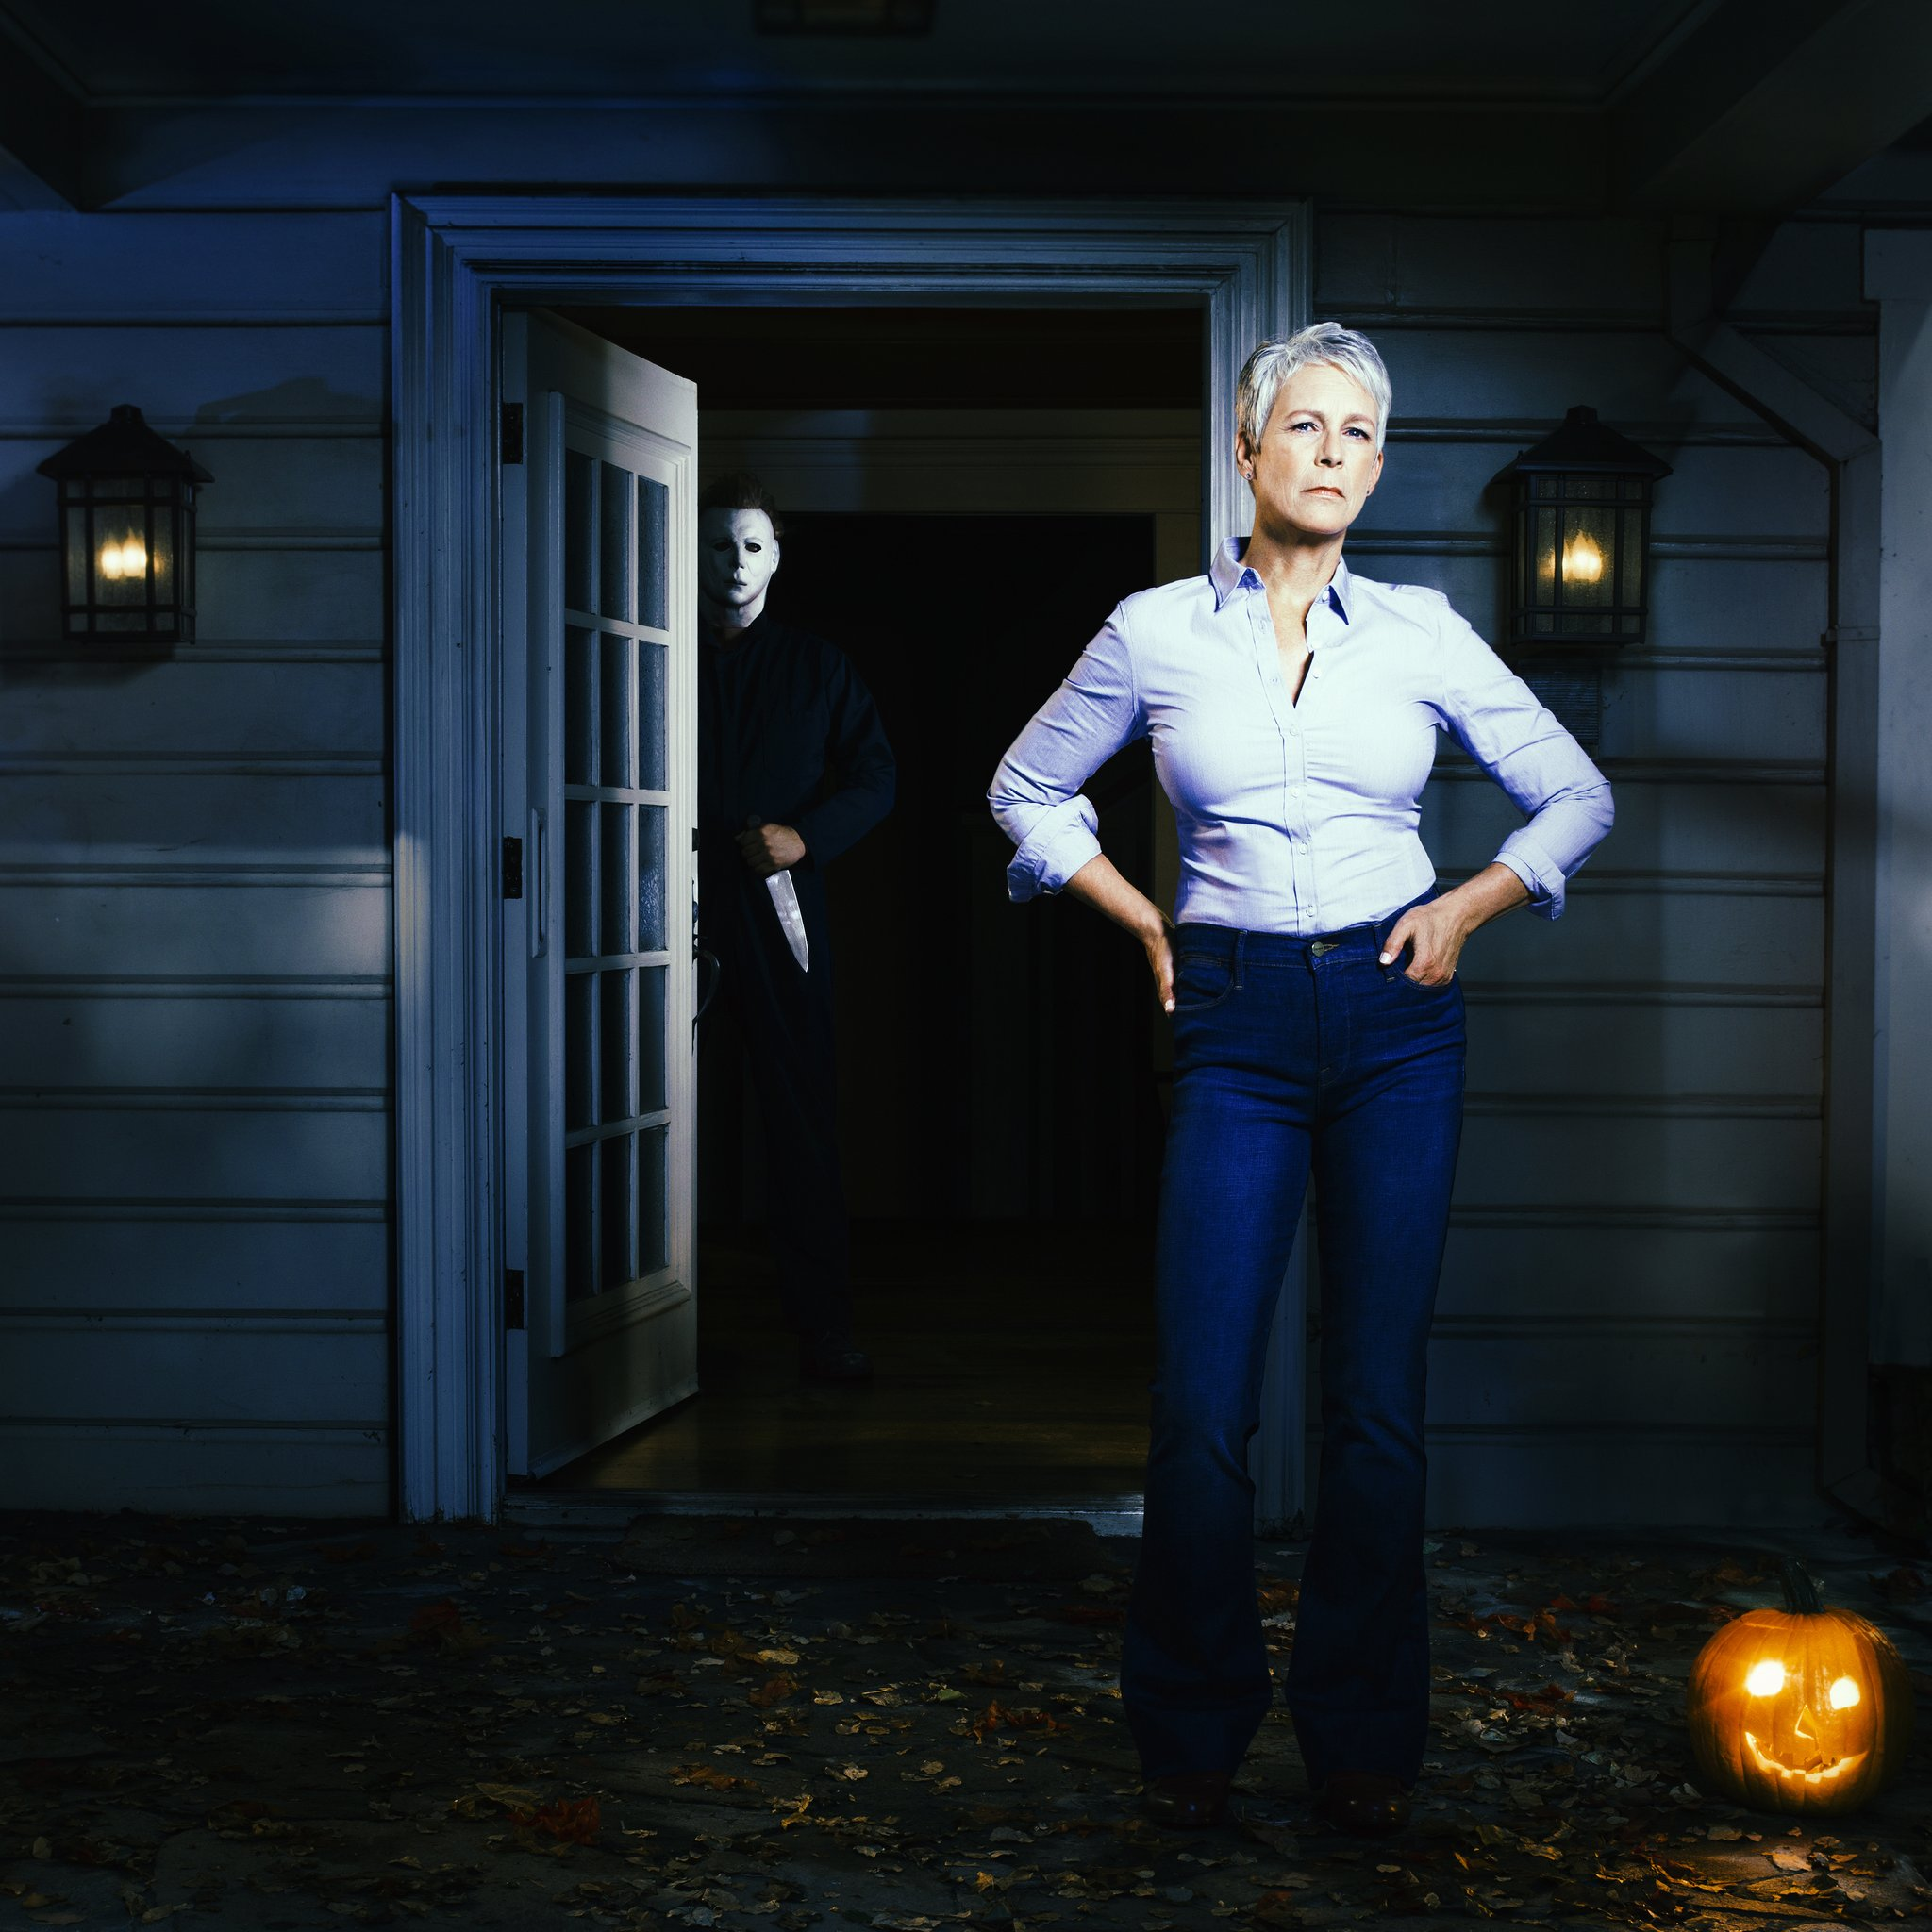 tmp_3qW47k_fdc24fbb284050cd_117_Halloween_LA_10MB.jpg